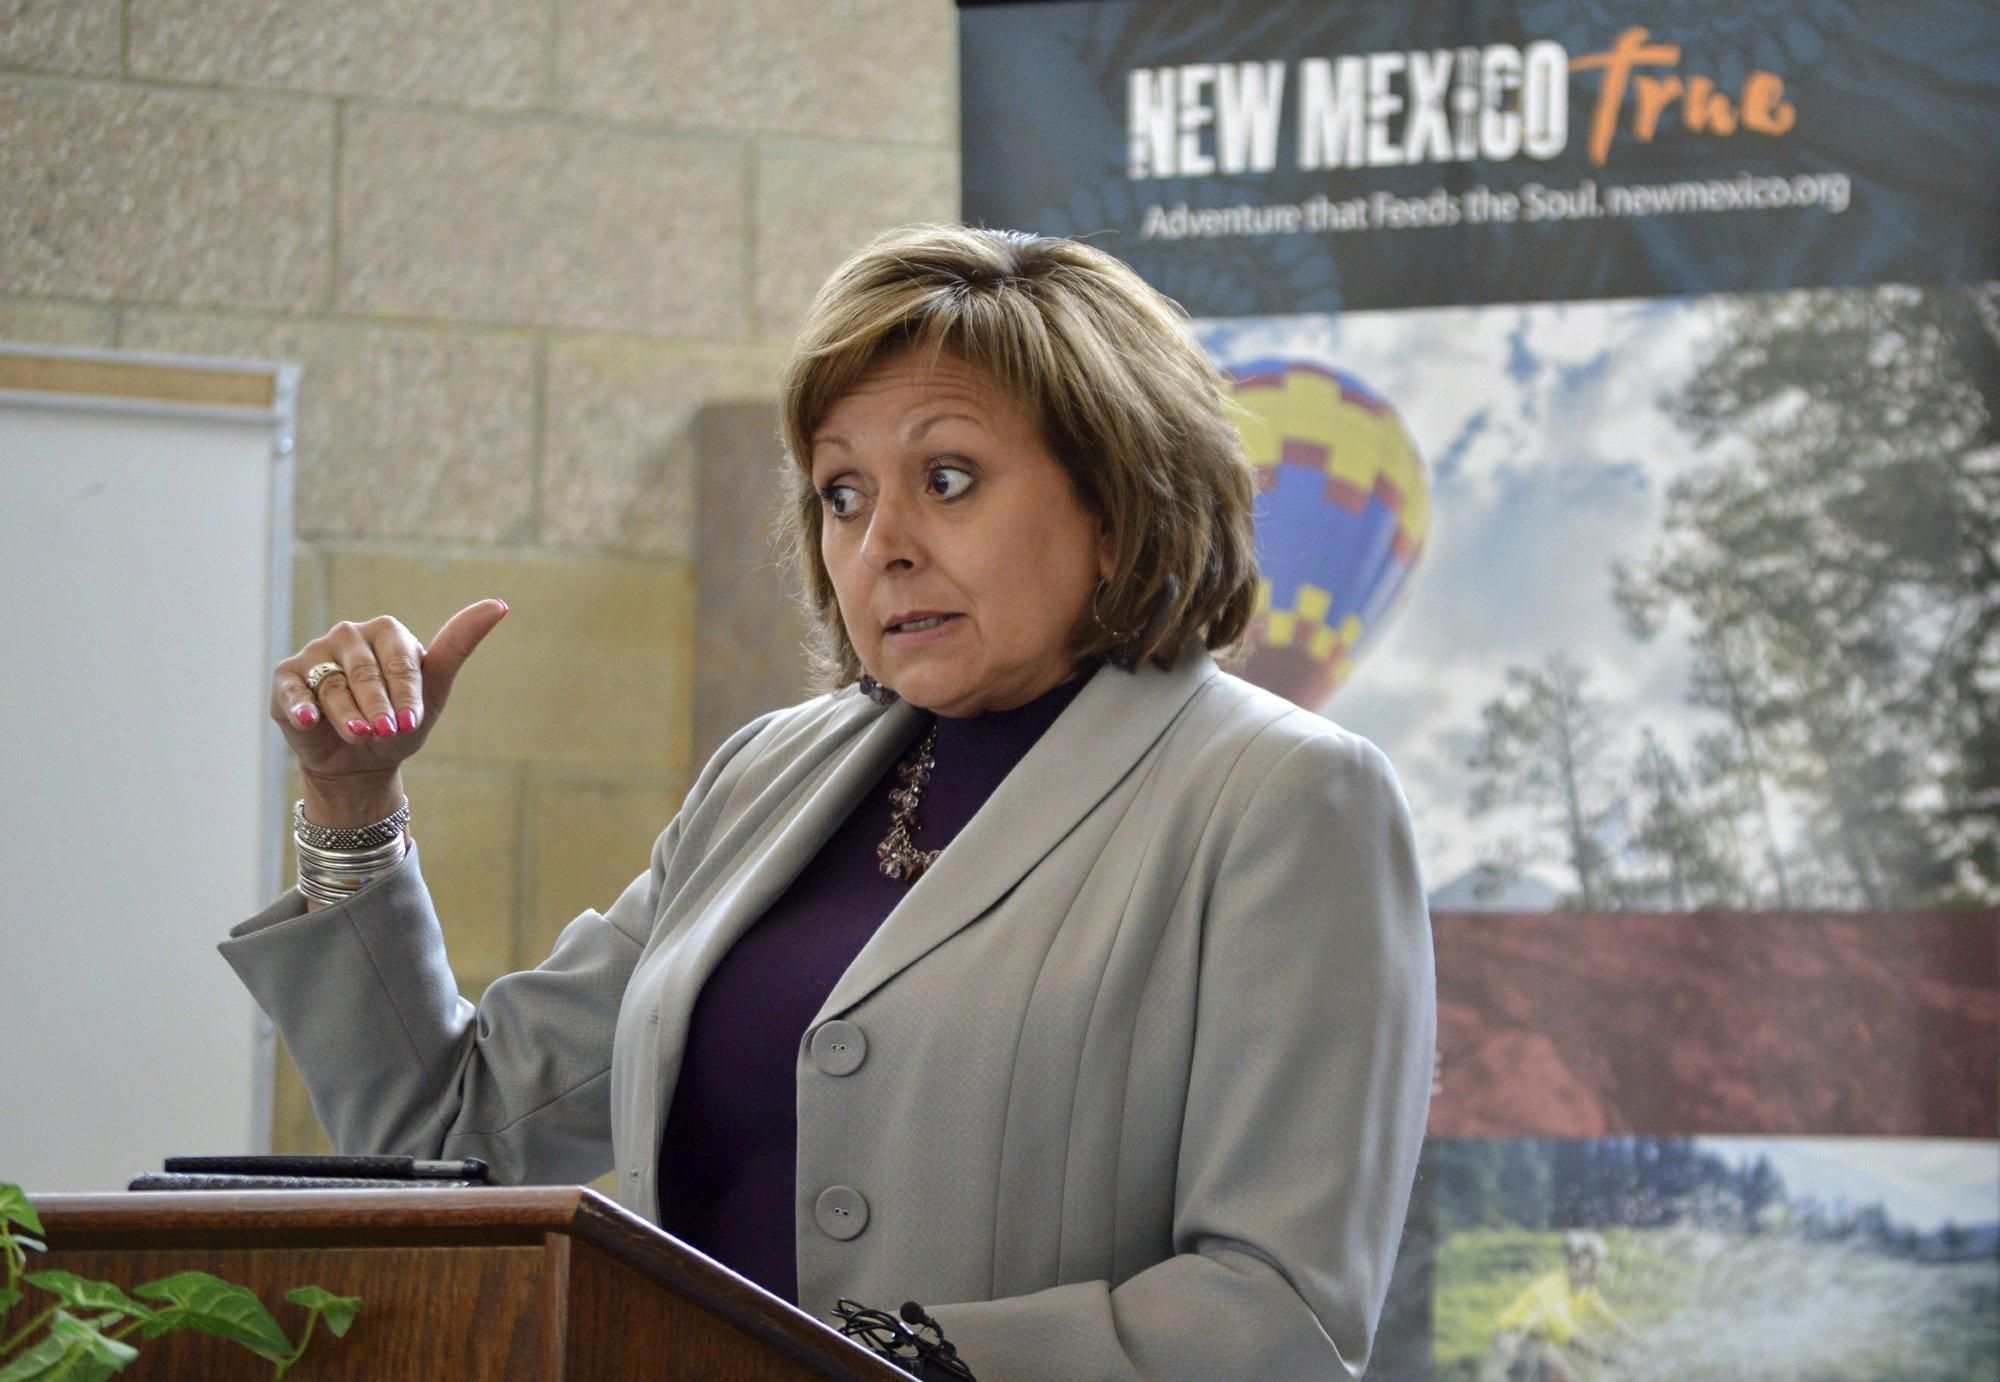 Susana Martinez to join board of Jeb Bush's ed reform group